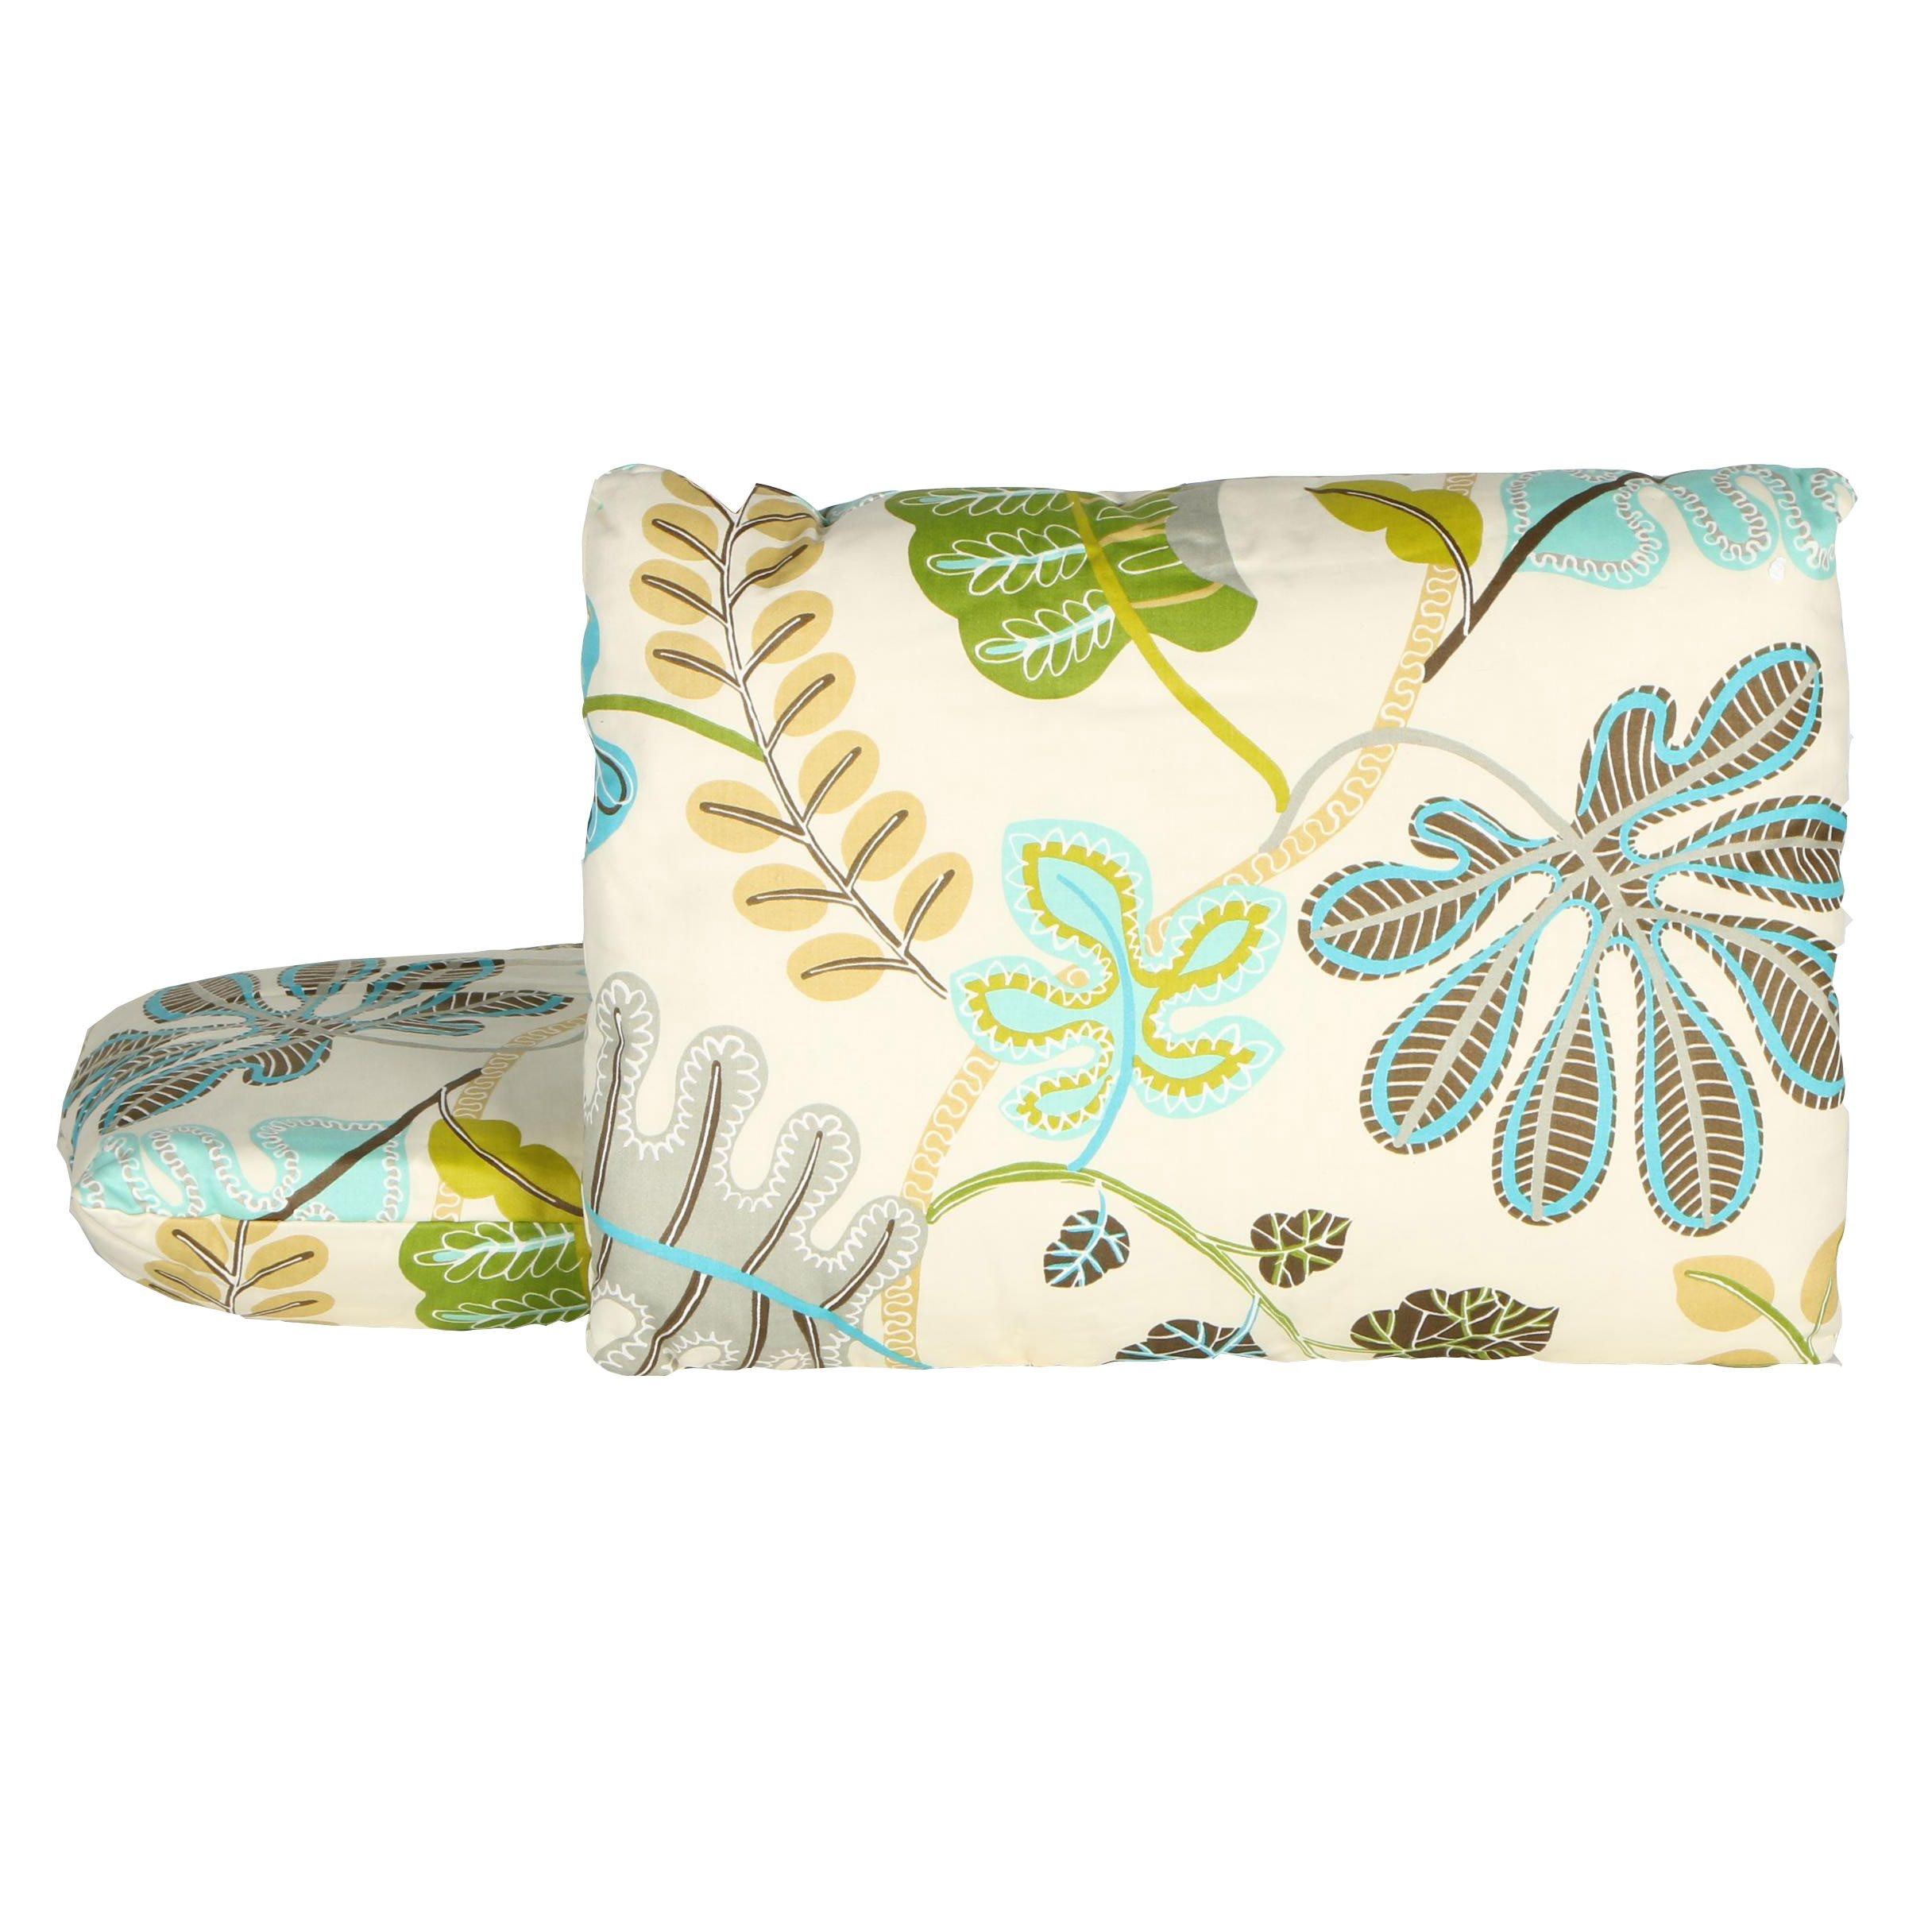 Pair of Floral Decorative Pillows